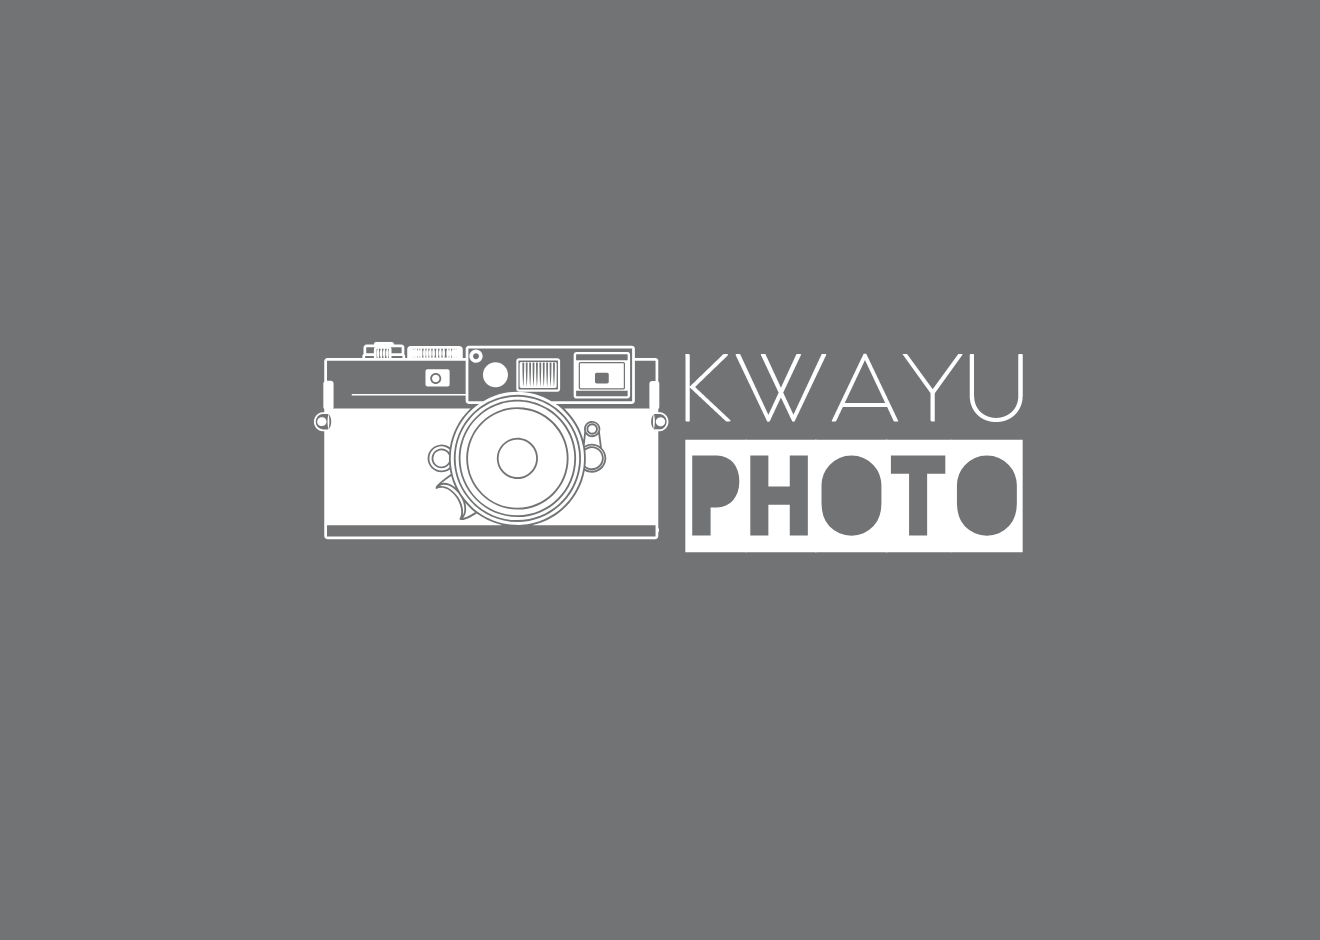 Kwayu Photo